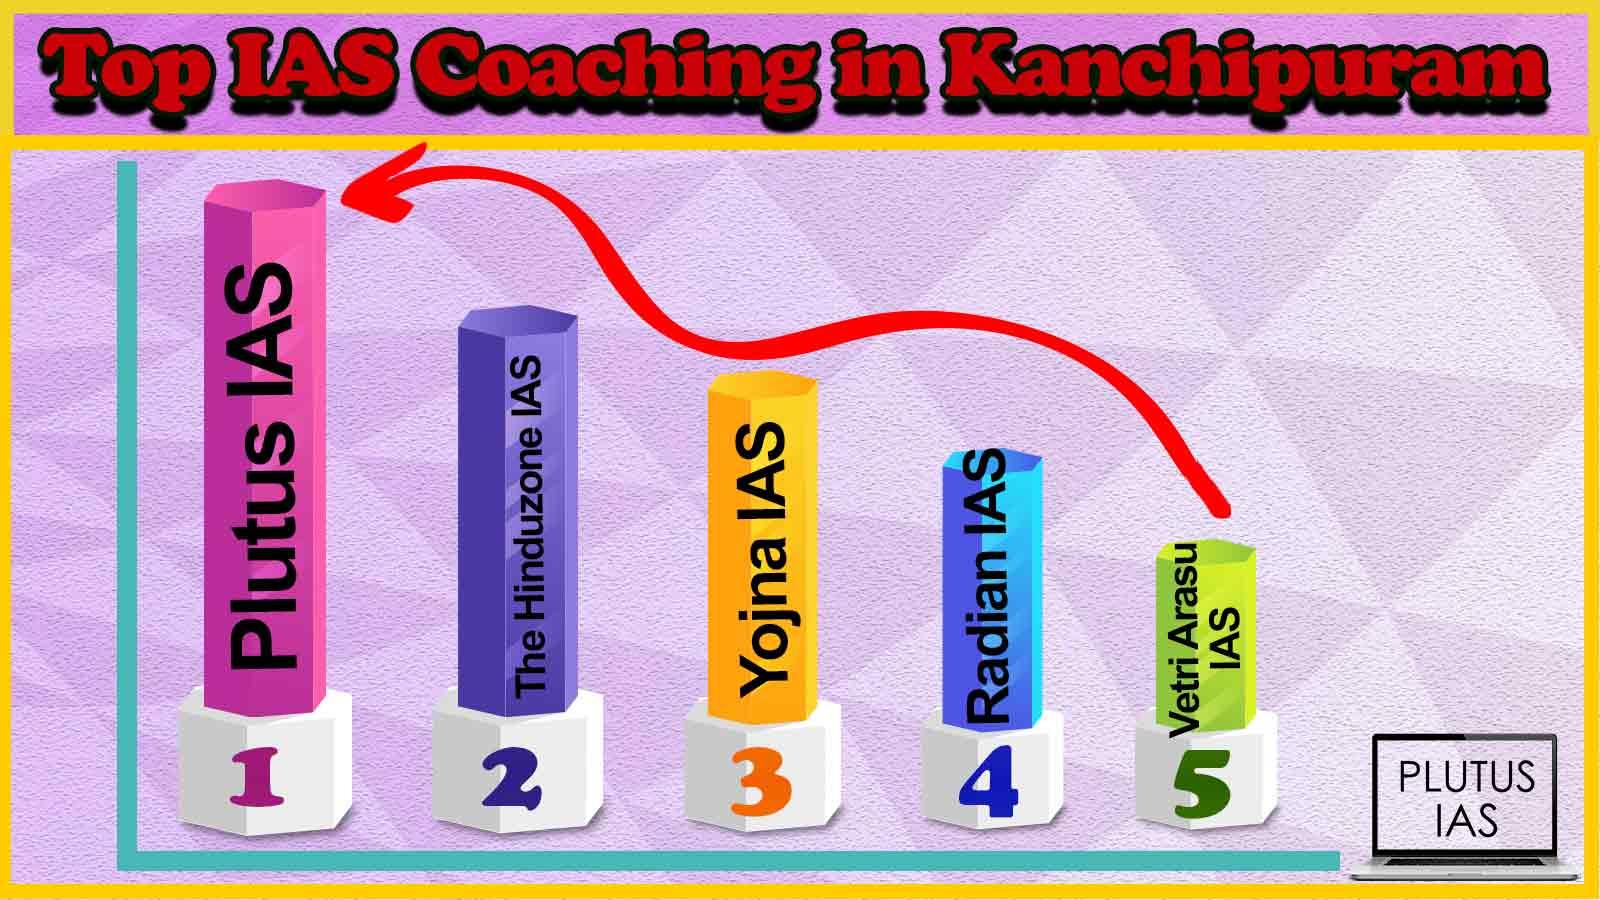 Best 10 IAS Coaching in Kanchipuram